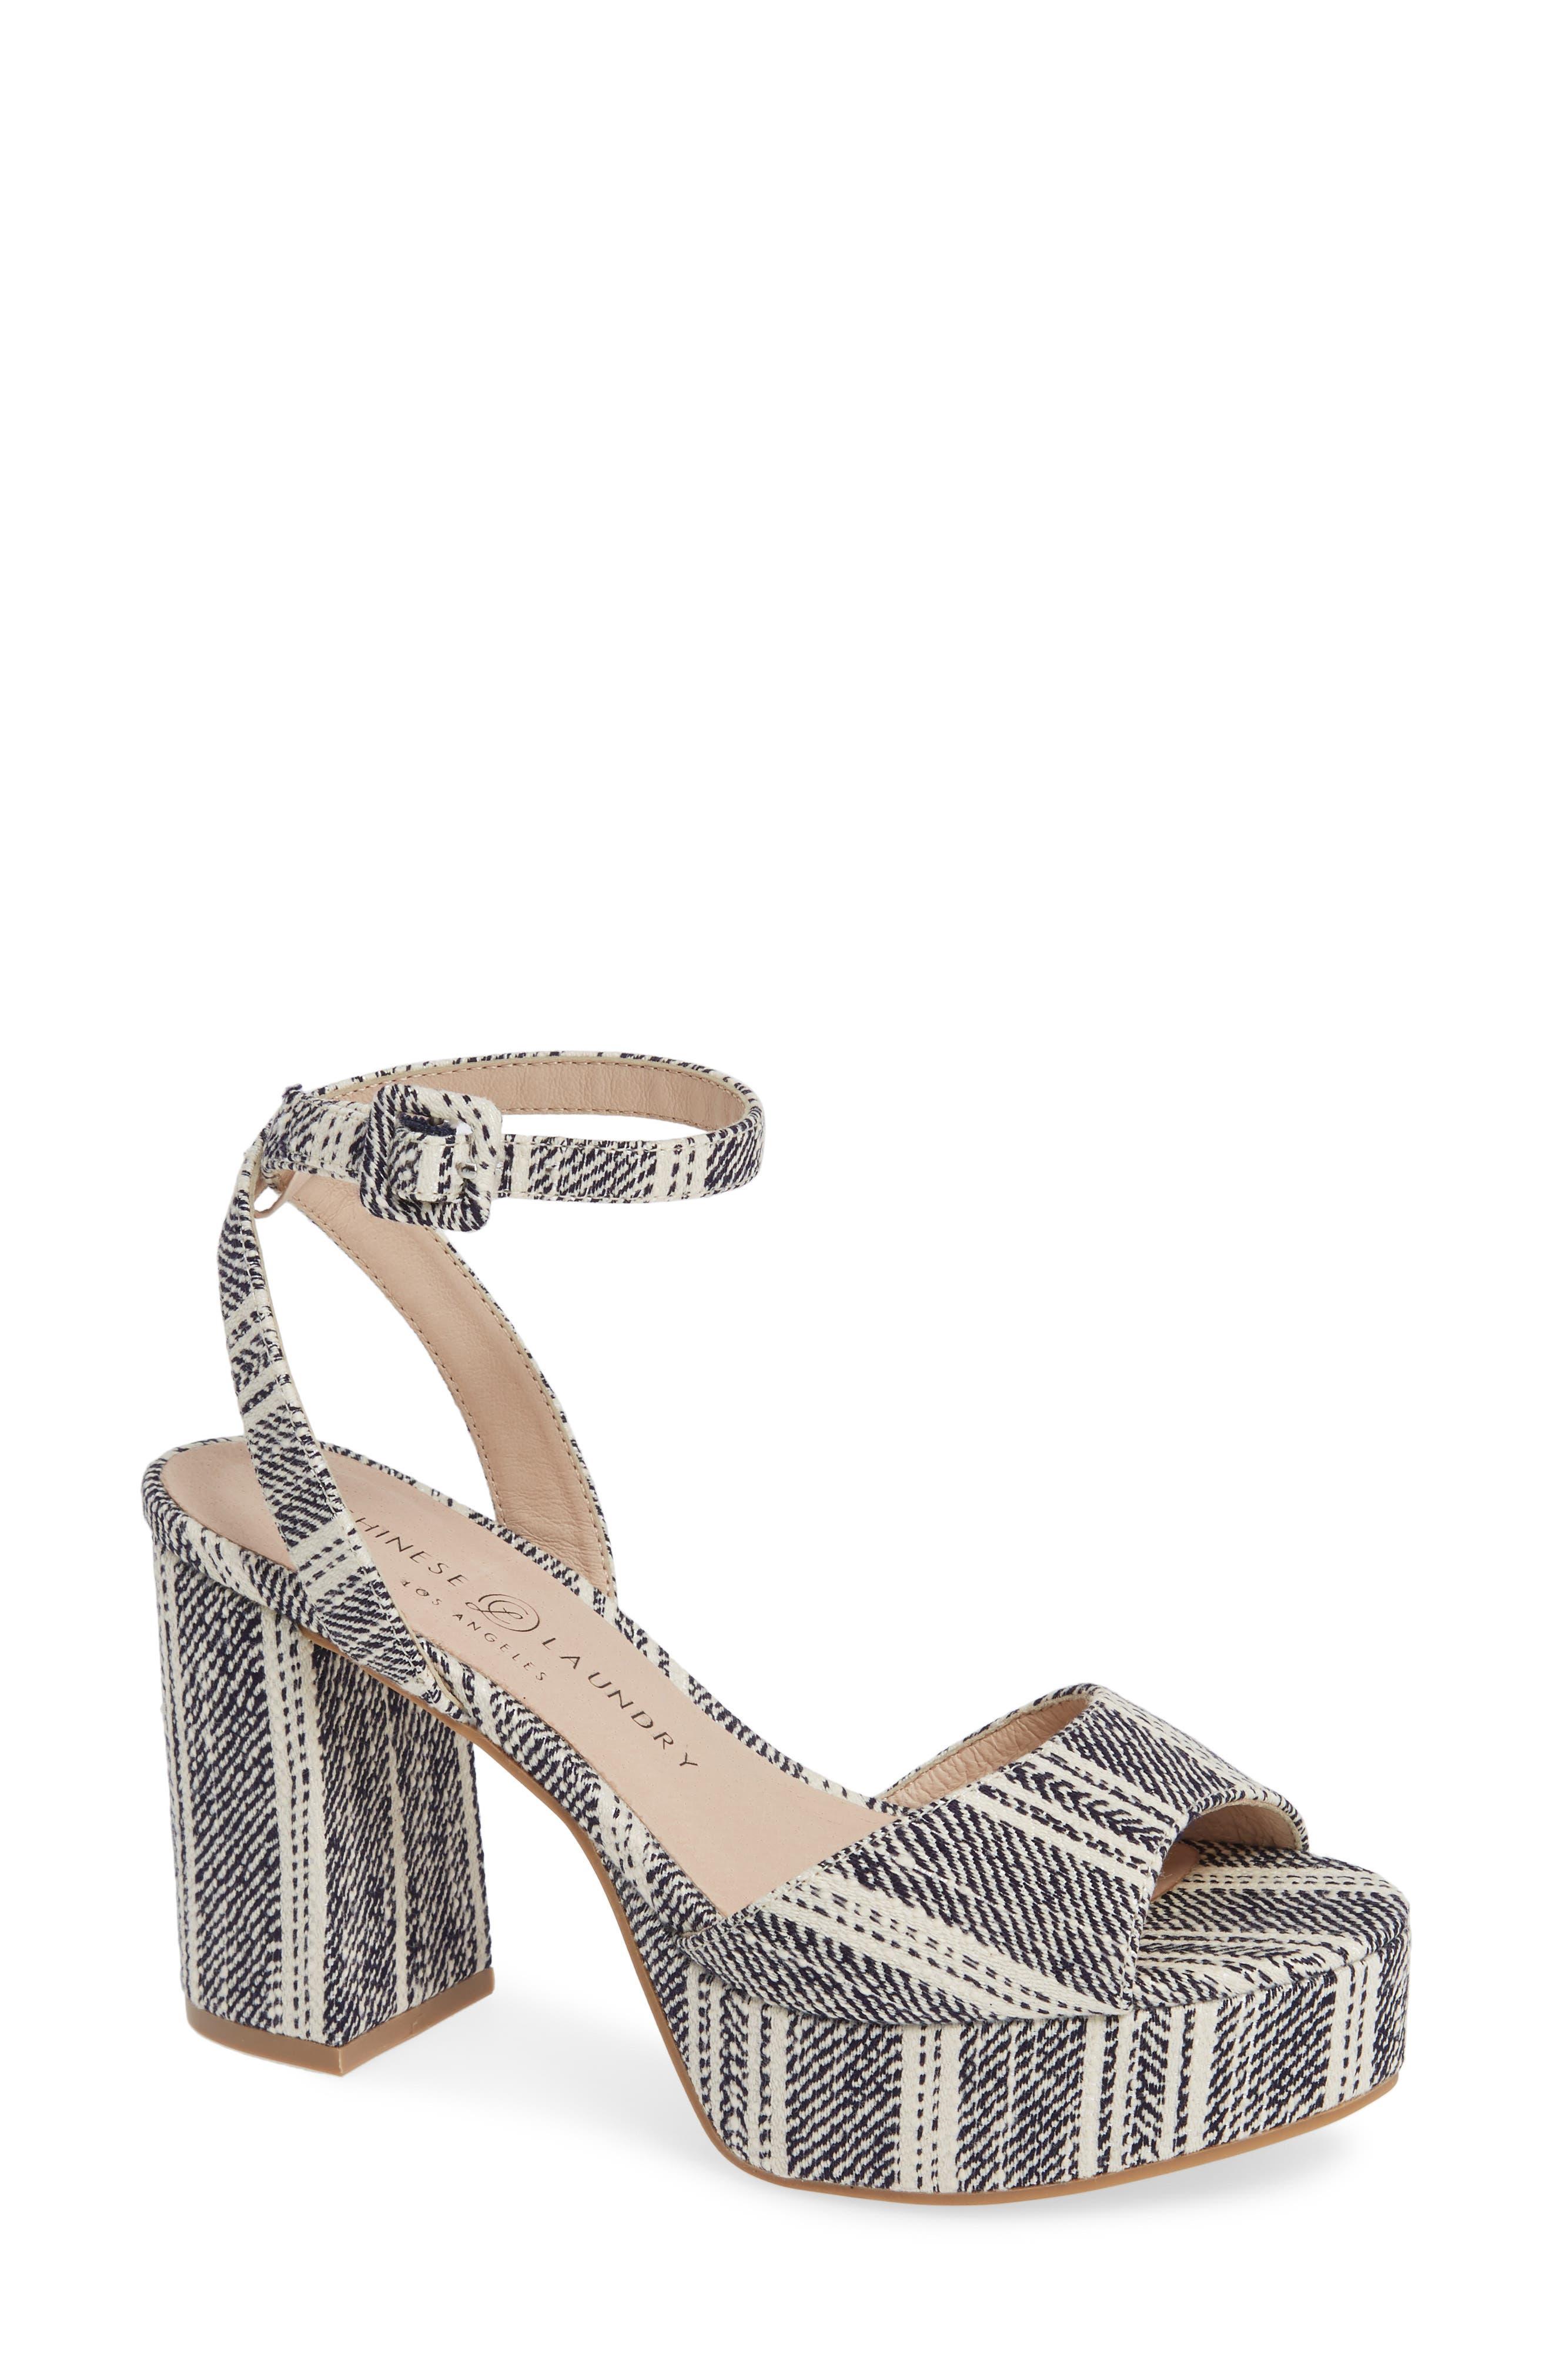 ad984b97e62e Blue Block-Heel Sandals for Women